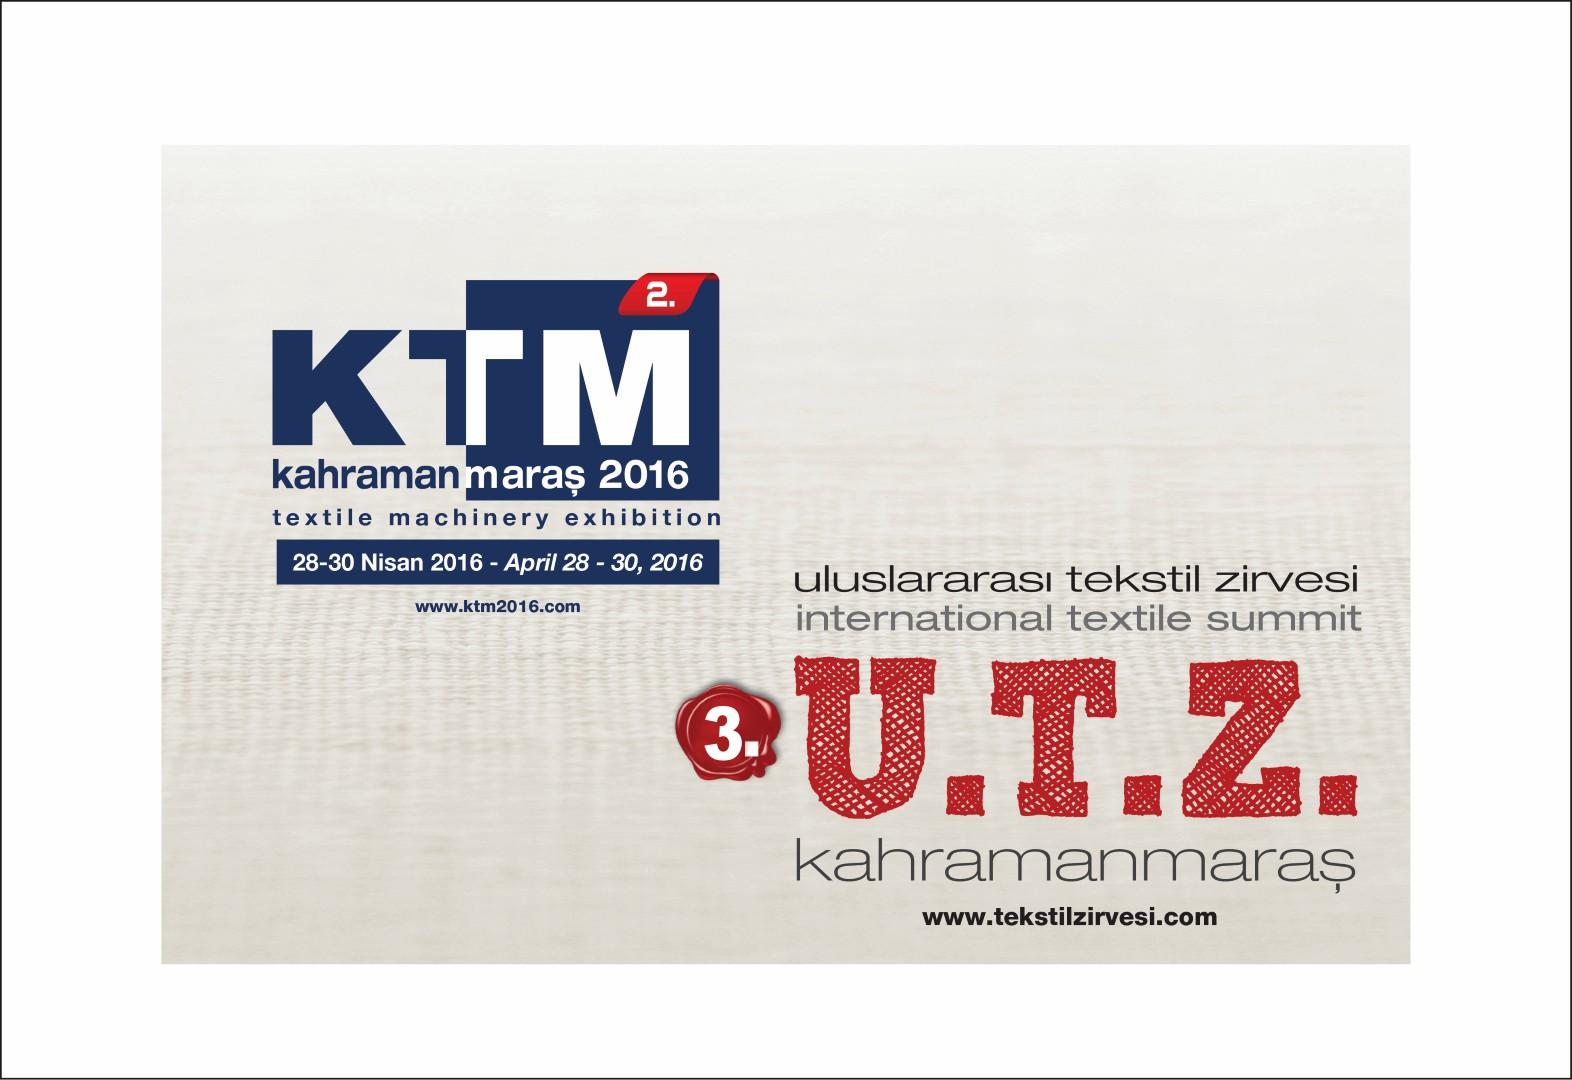 KahramanmaraşTextile Machines Show: KTM2016